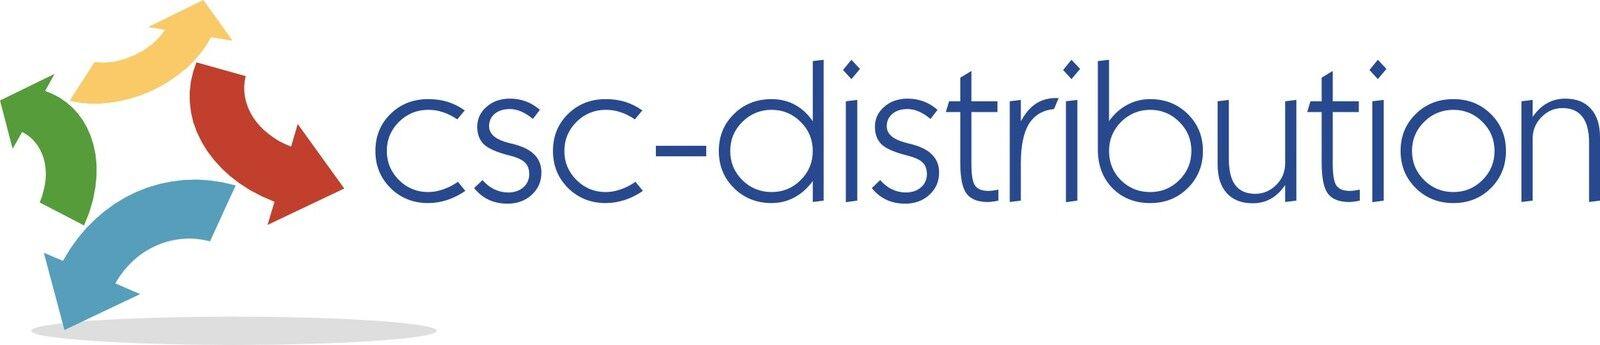 csc-distribution